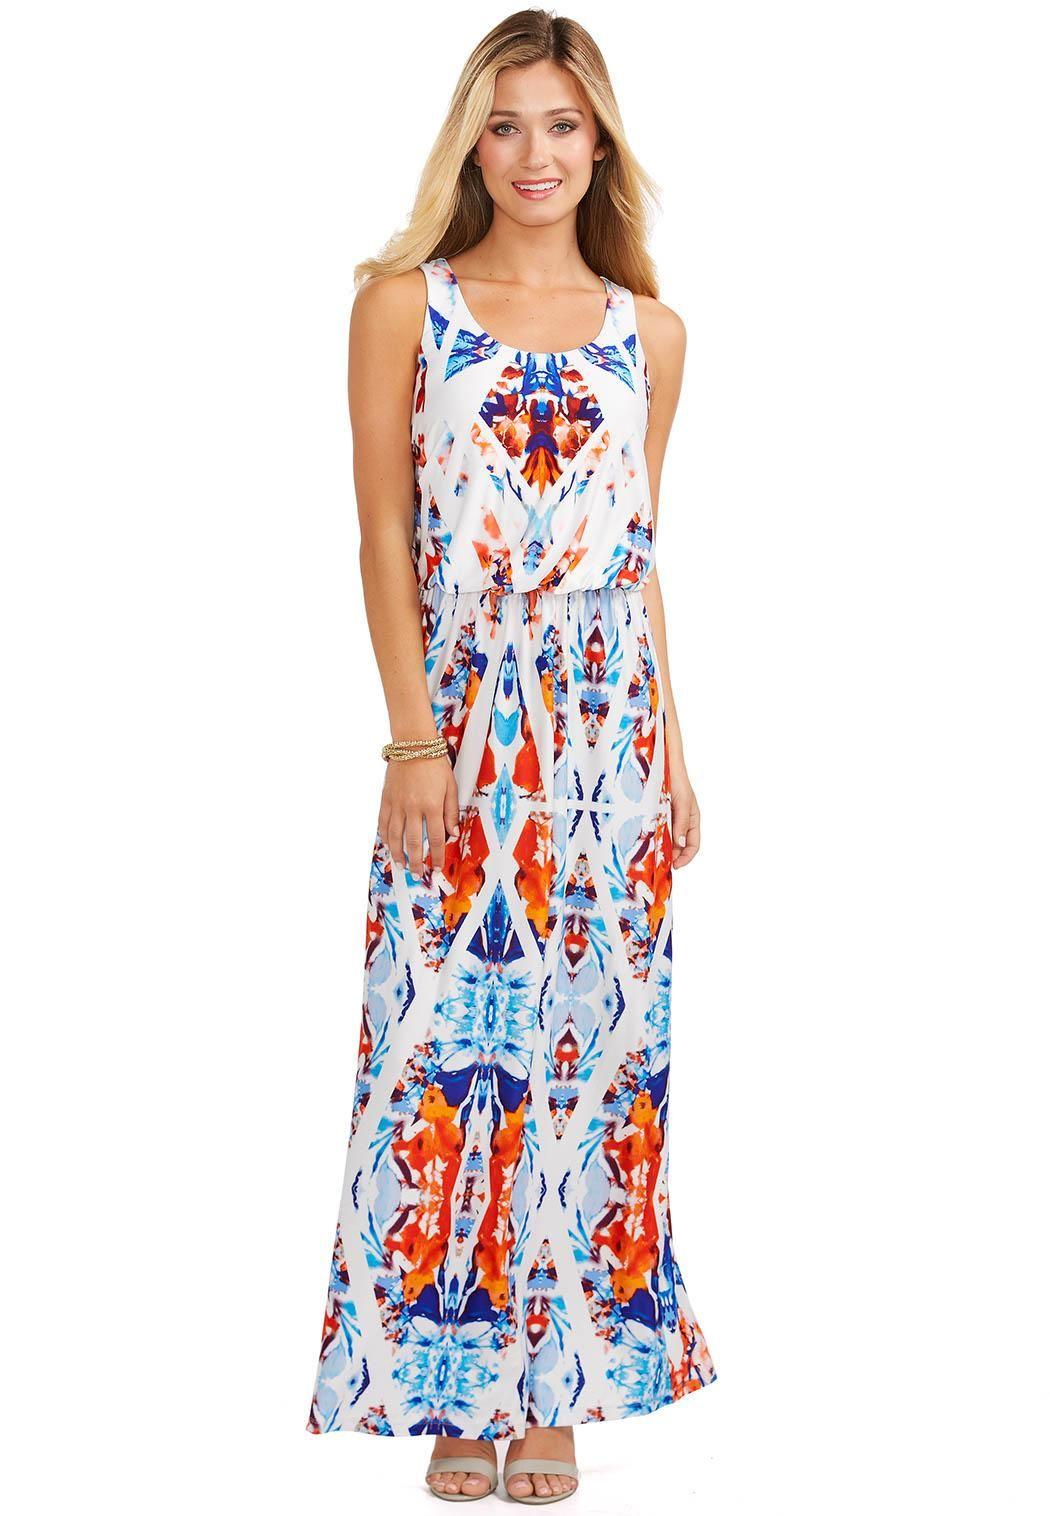 a0aeb9bd167c Kaleidoscope Maxi Dress Dresses Cato Fashions | Lovely Prints ...